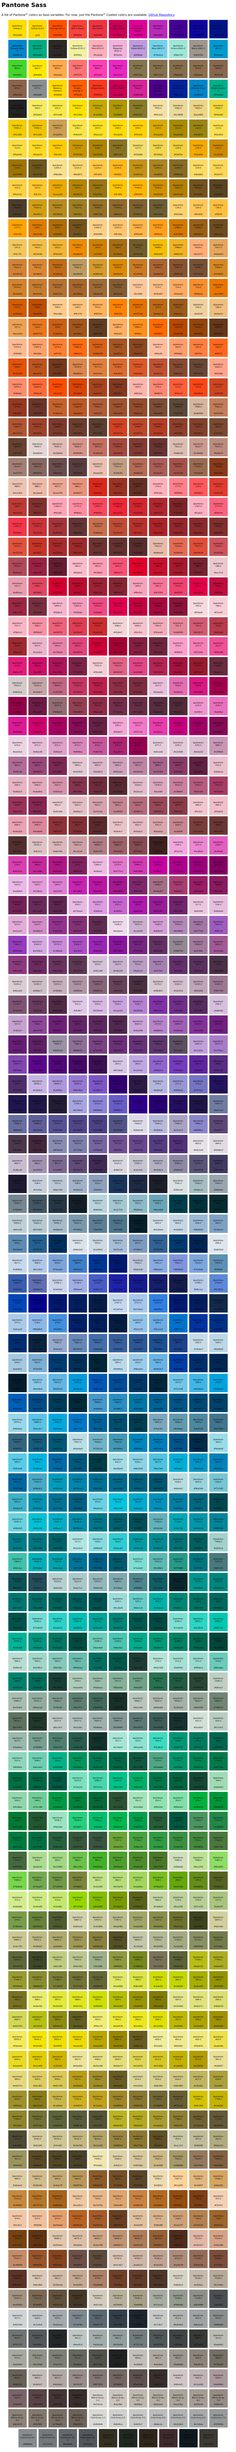 Sass pantone colours? http://damonbauer.github.io/Pantone-Sass/